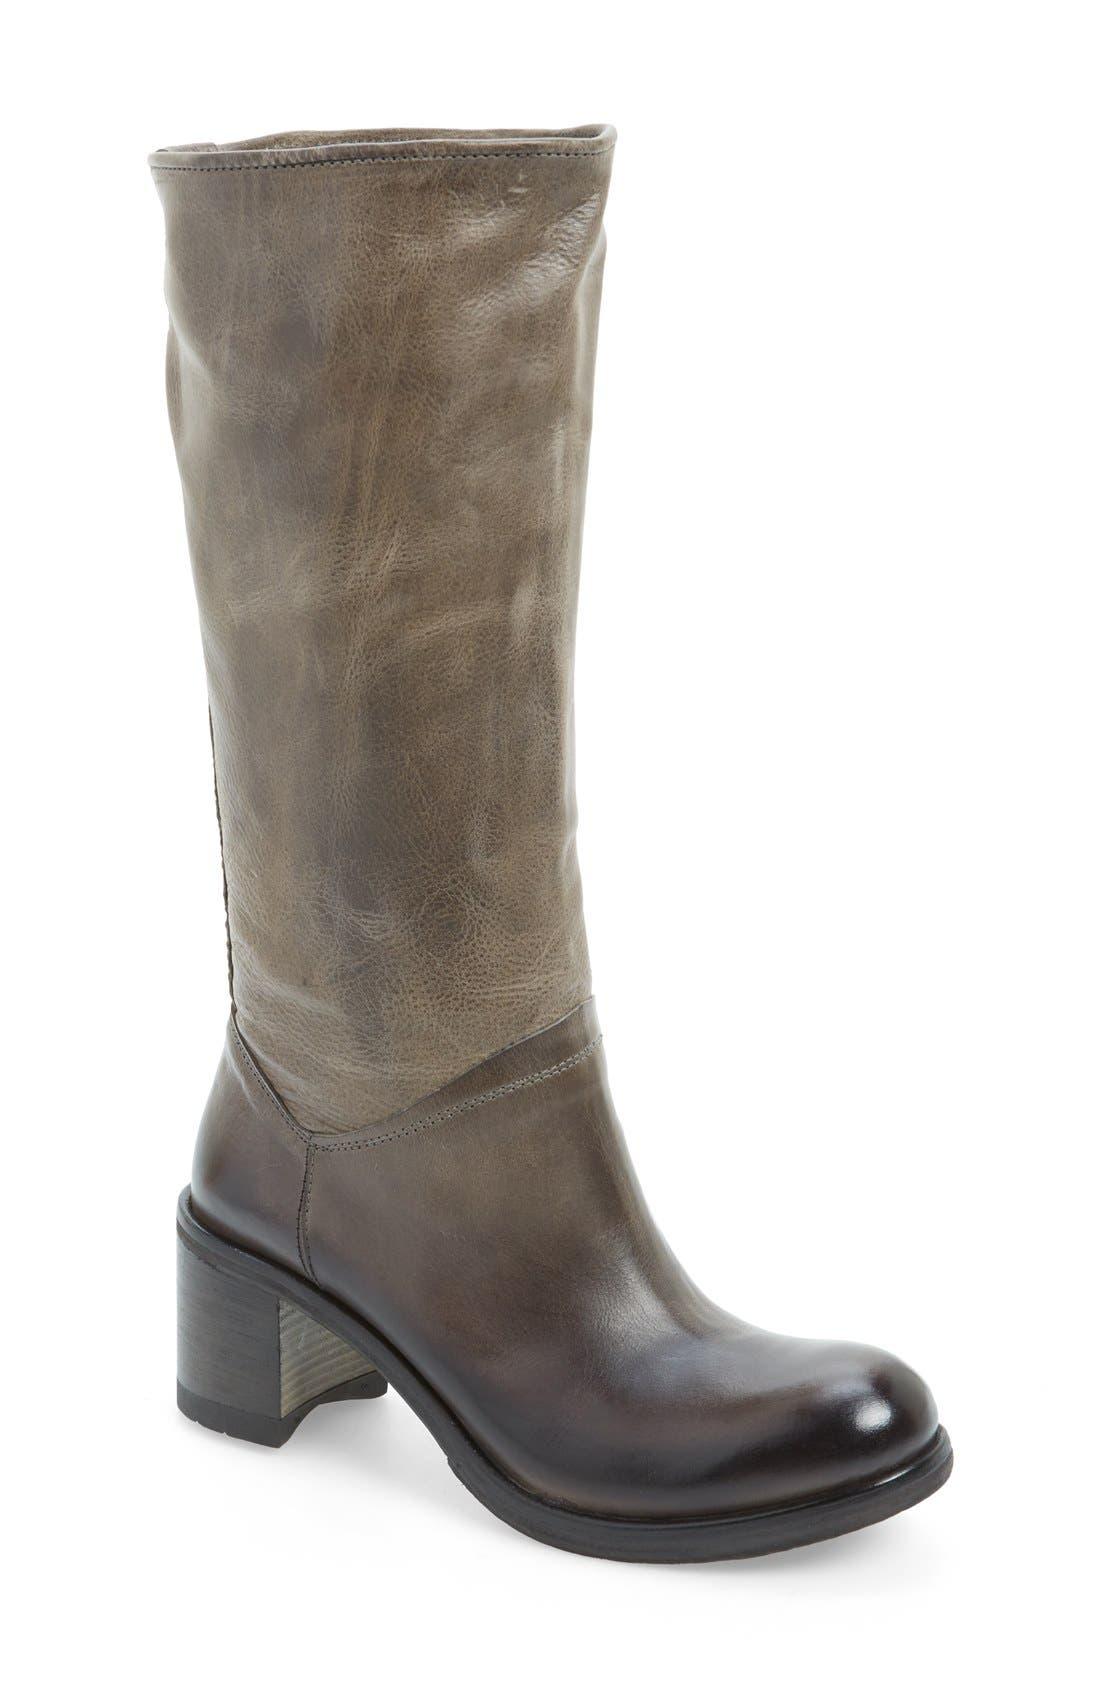 Alternate Image 1 Selected - KBR Knee-High Boot (Women)